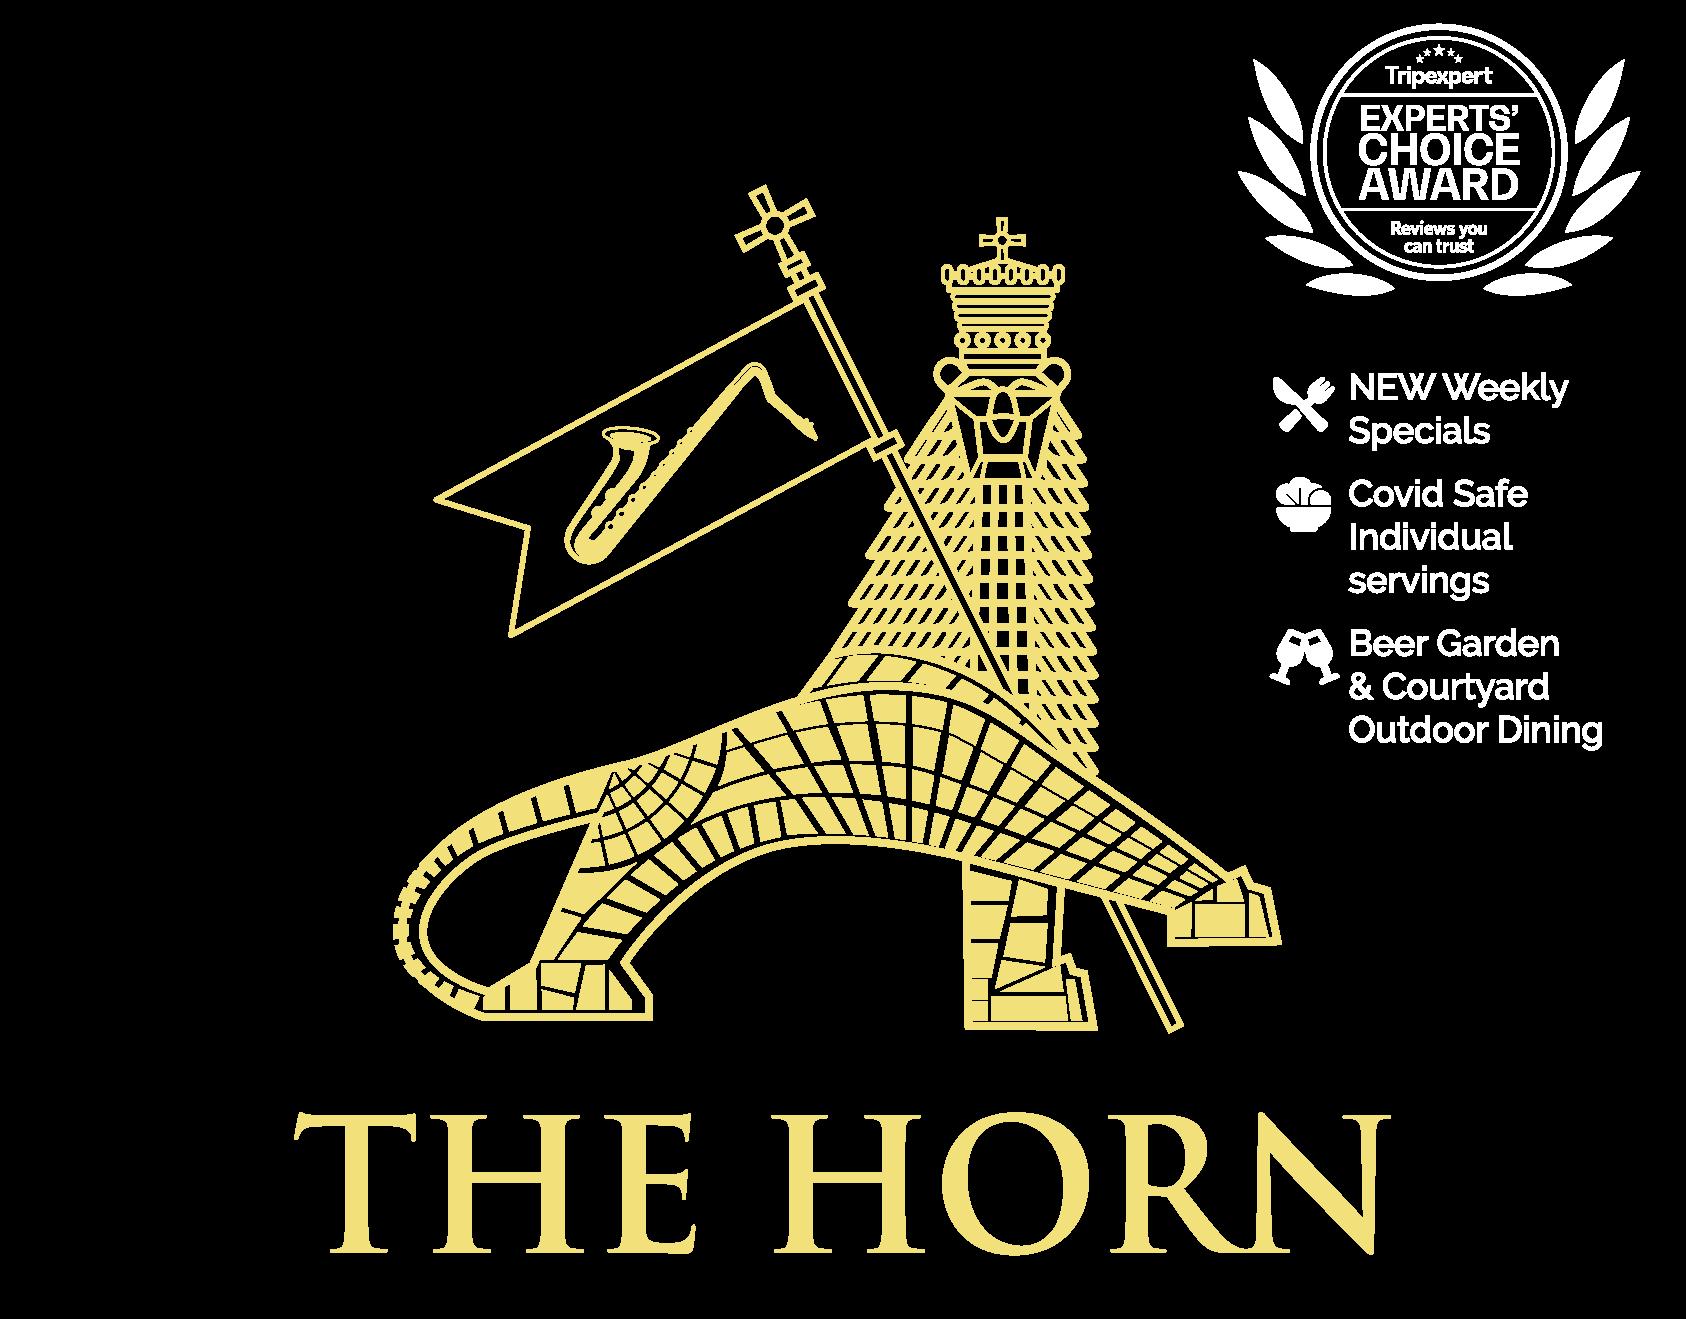 The Horn African Restaurant & Cafe